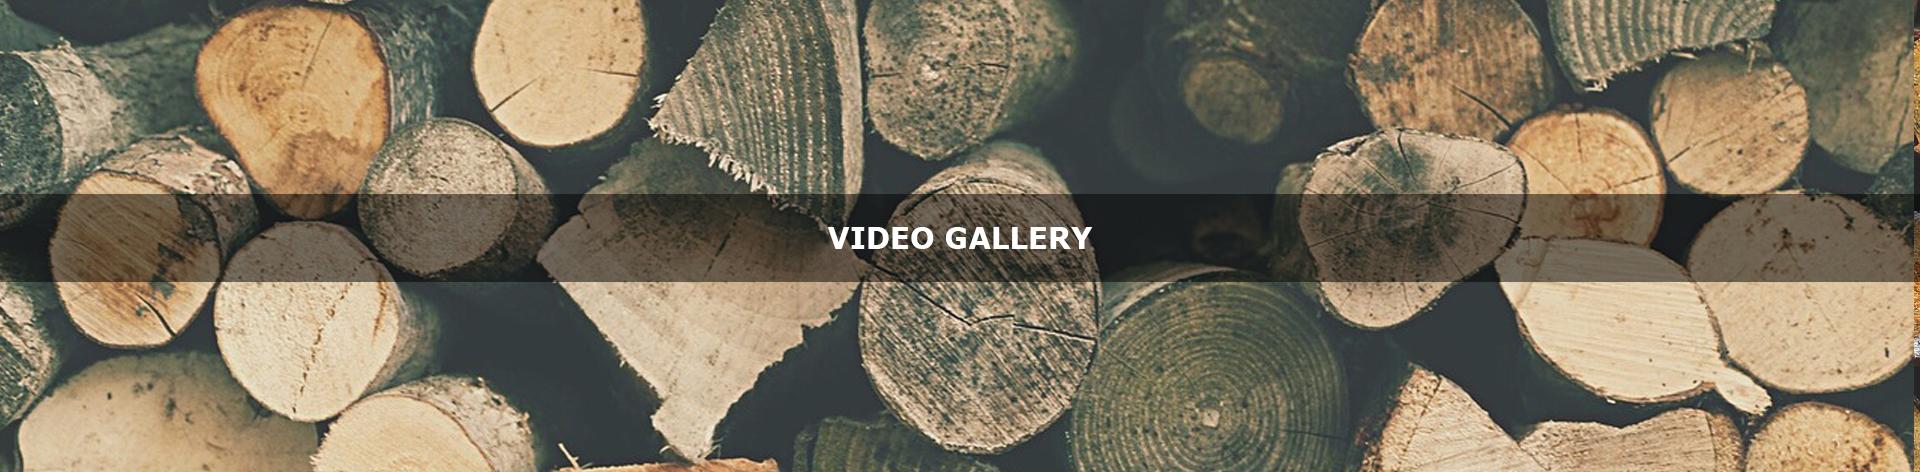 Stove World Glasgow Scotland Stove Video Gallery